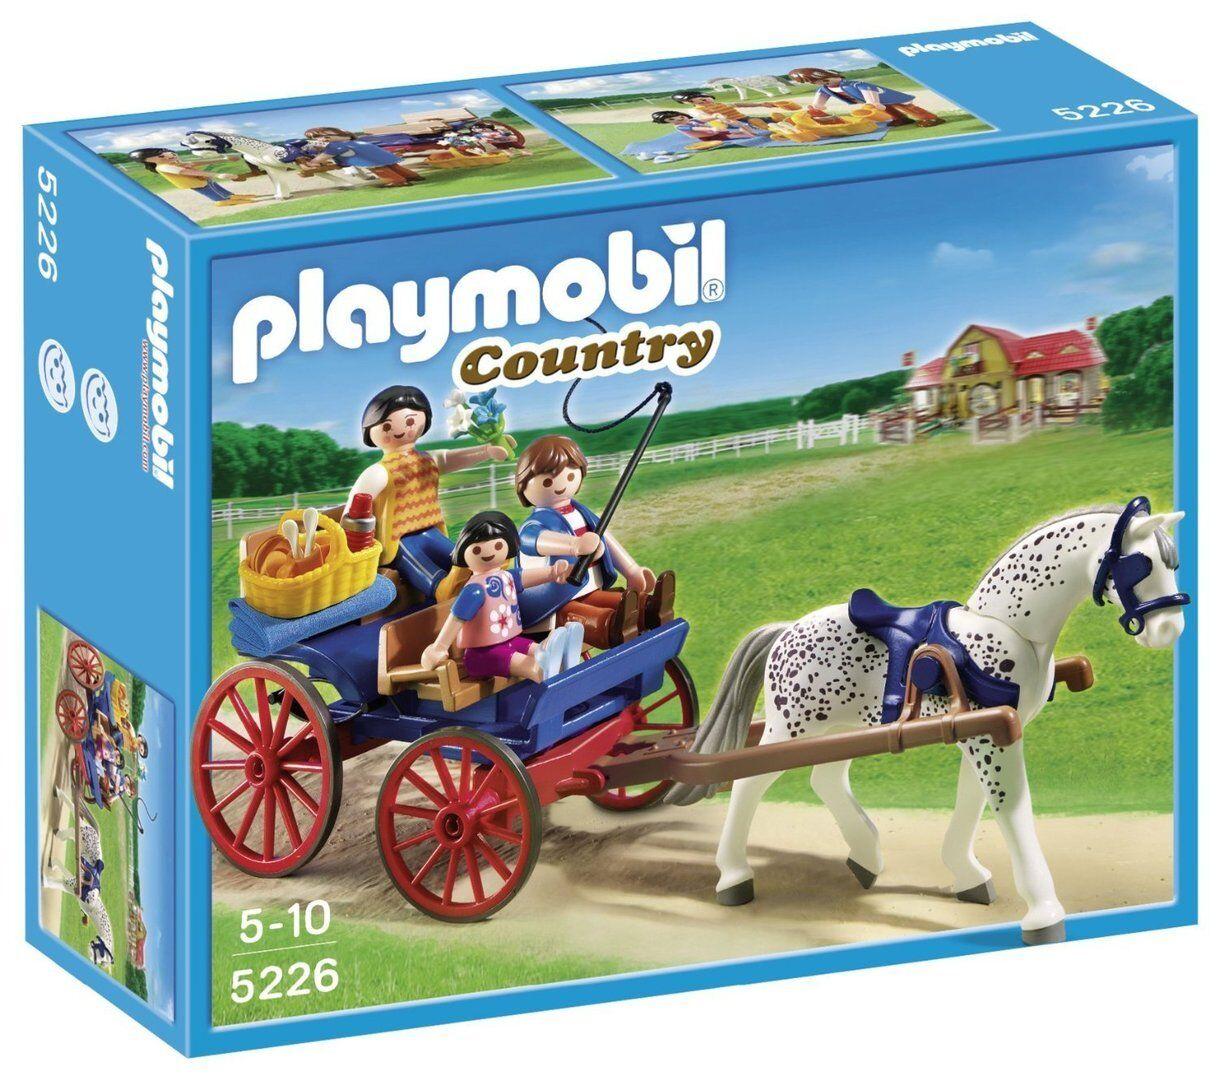 Playmobil 5226 - Carruaje con Caballo - NUEVO NUEVO NUEVO 550492